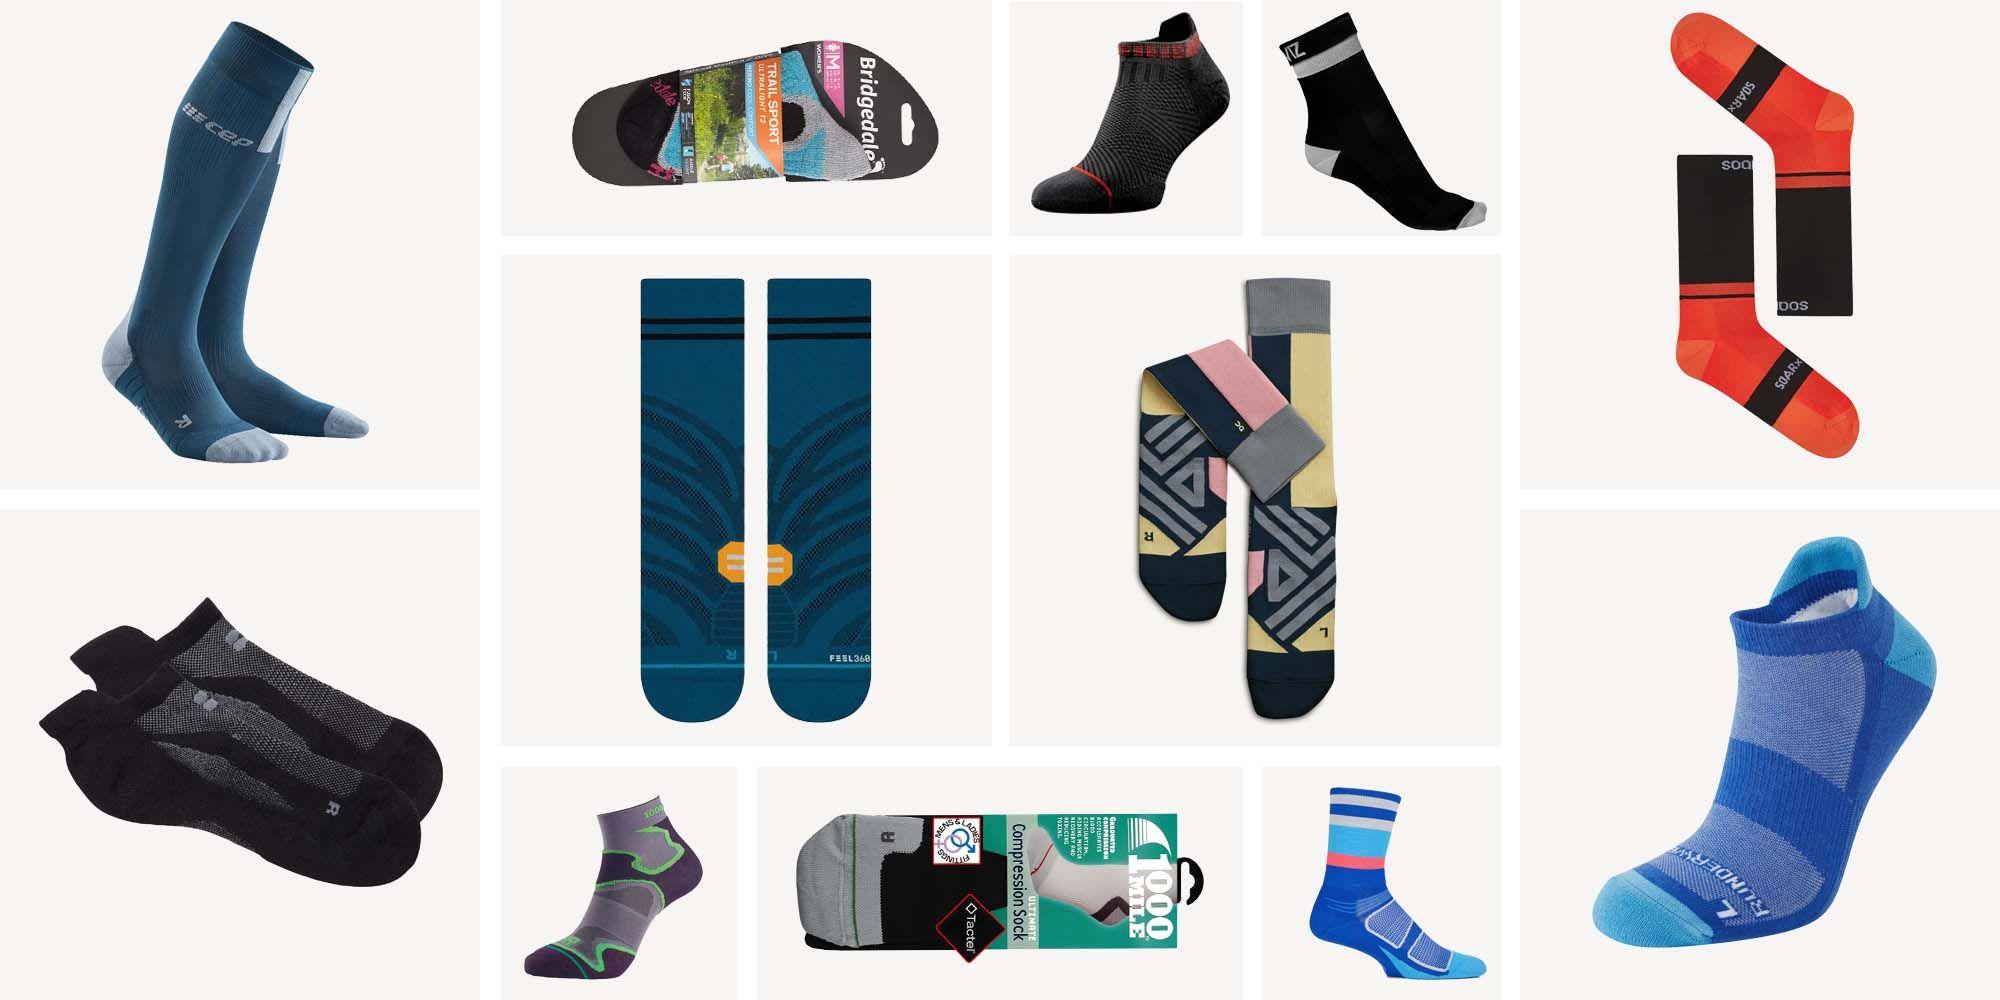 6 Pairs Low Cut Socks Performance Comfort Fit Running Socks